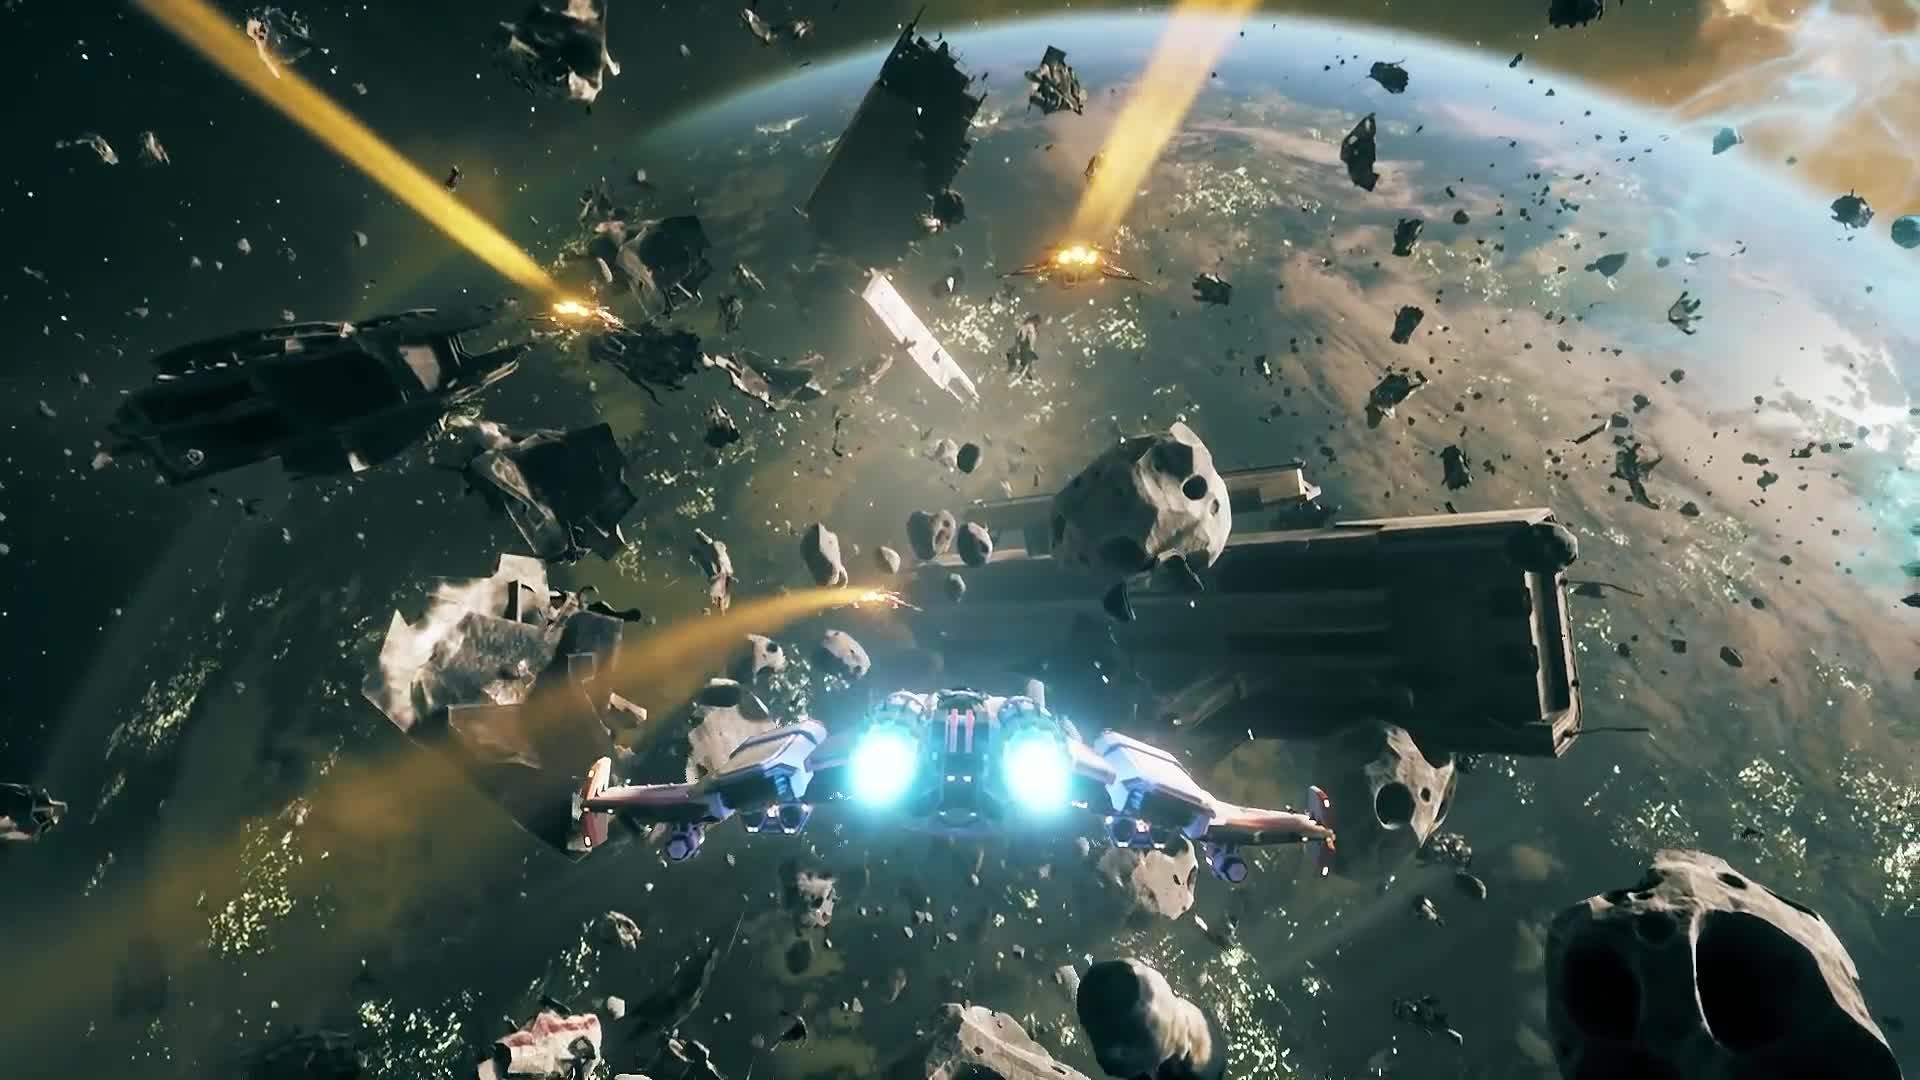 Space Shooter Everspace Trailer Feiert Den Early Access Release